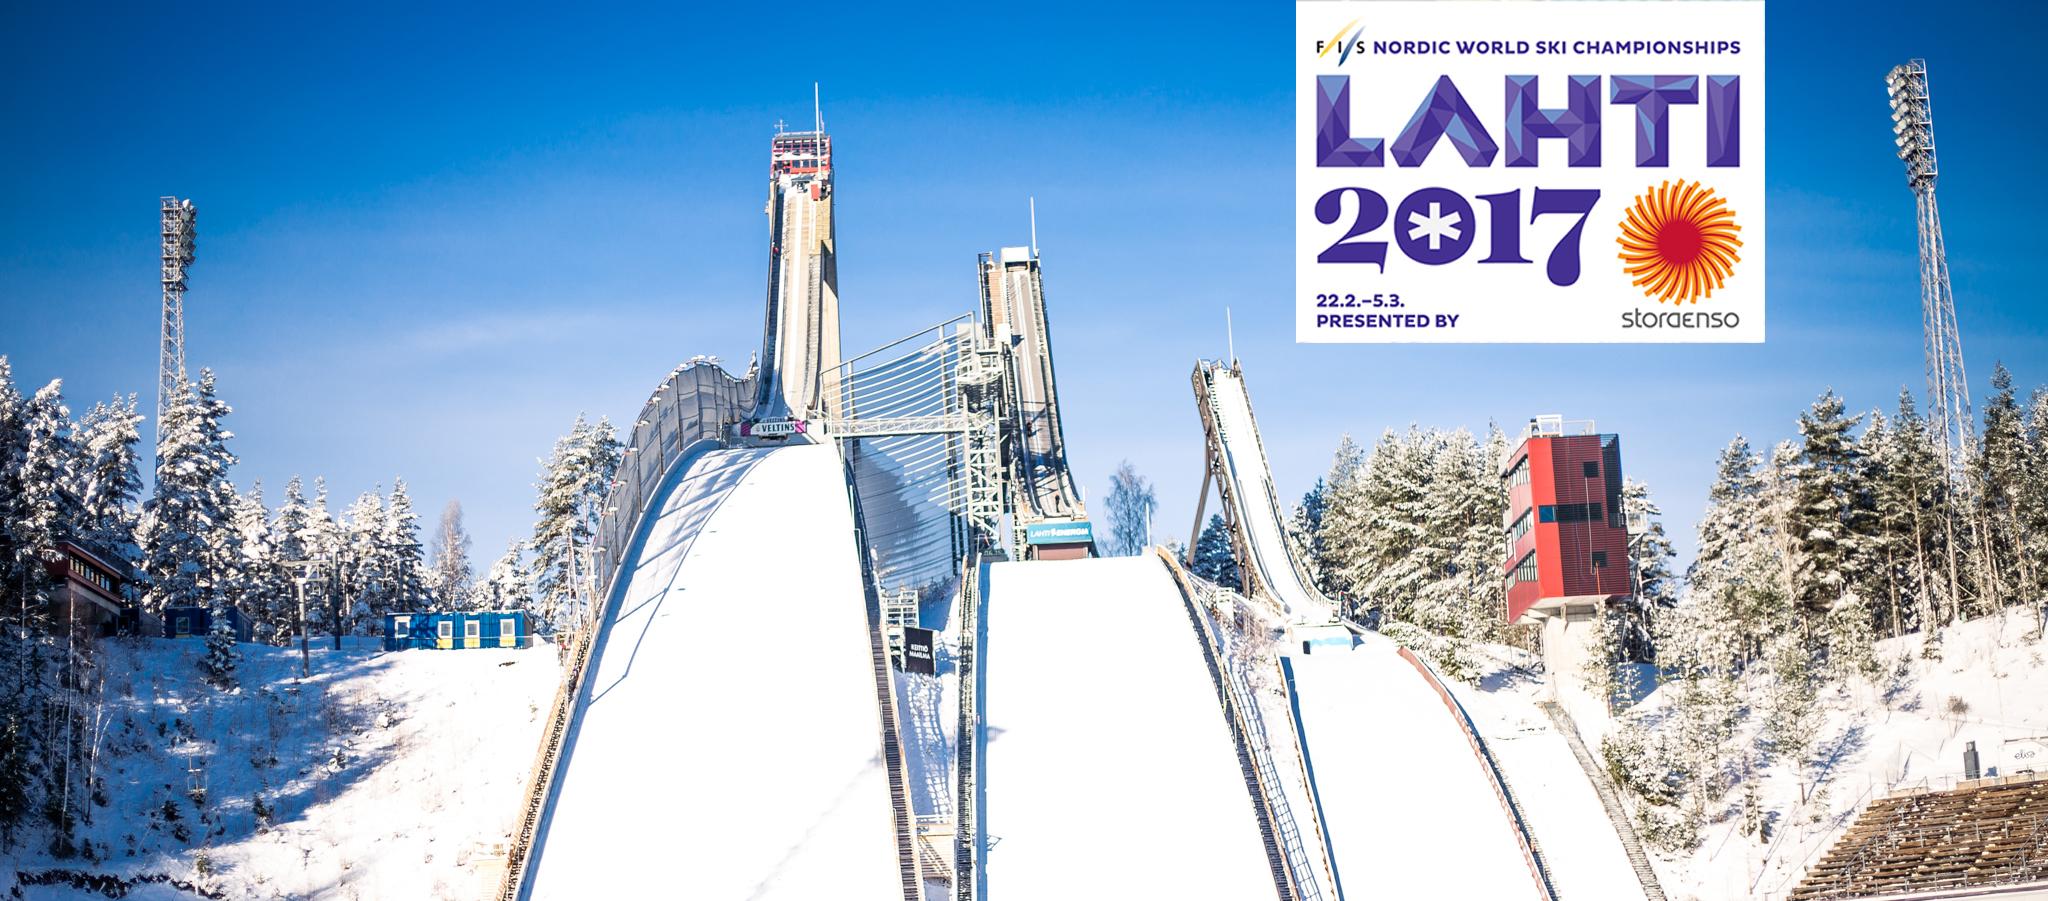 SES_910_Lahti_Skid-VM_2017-2